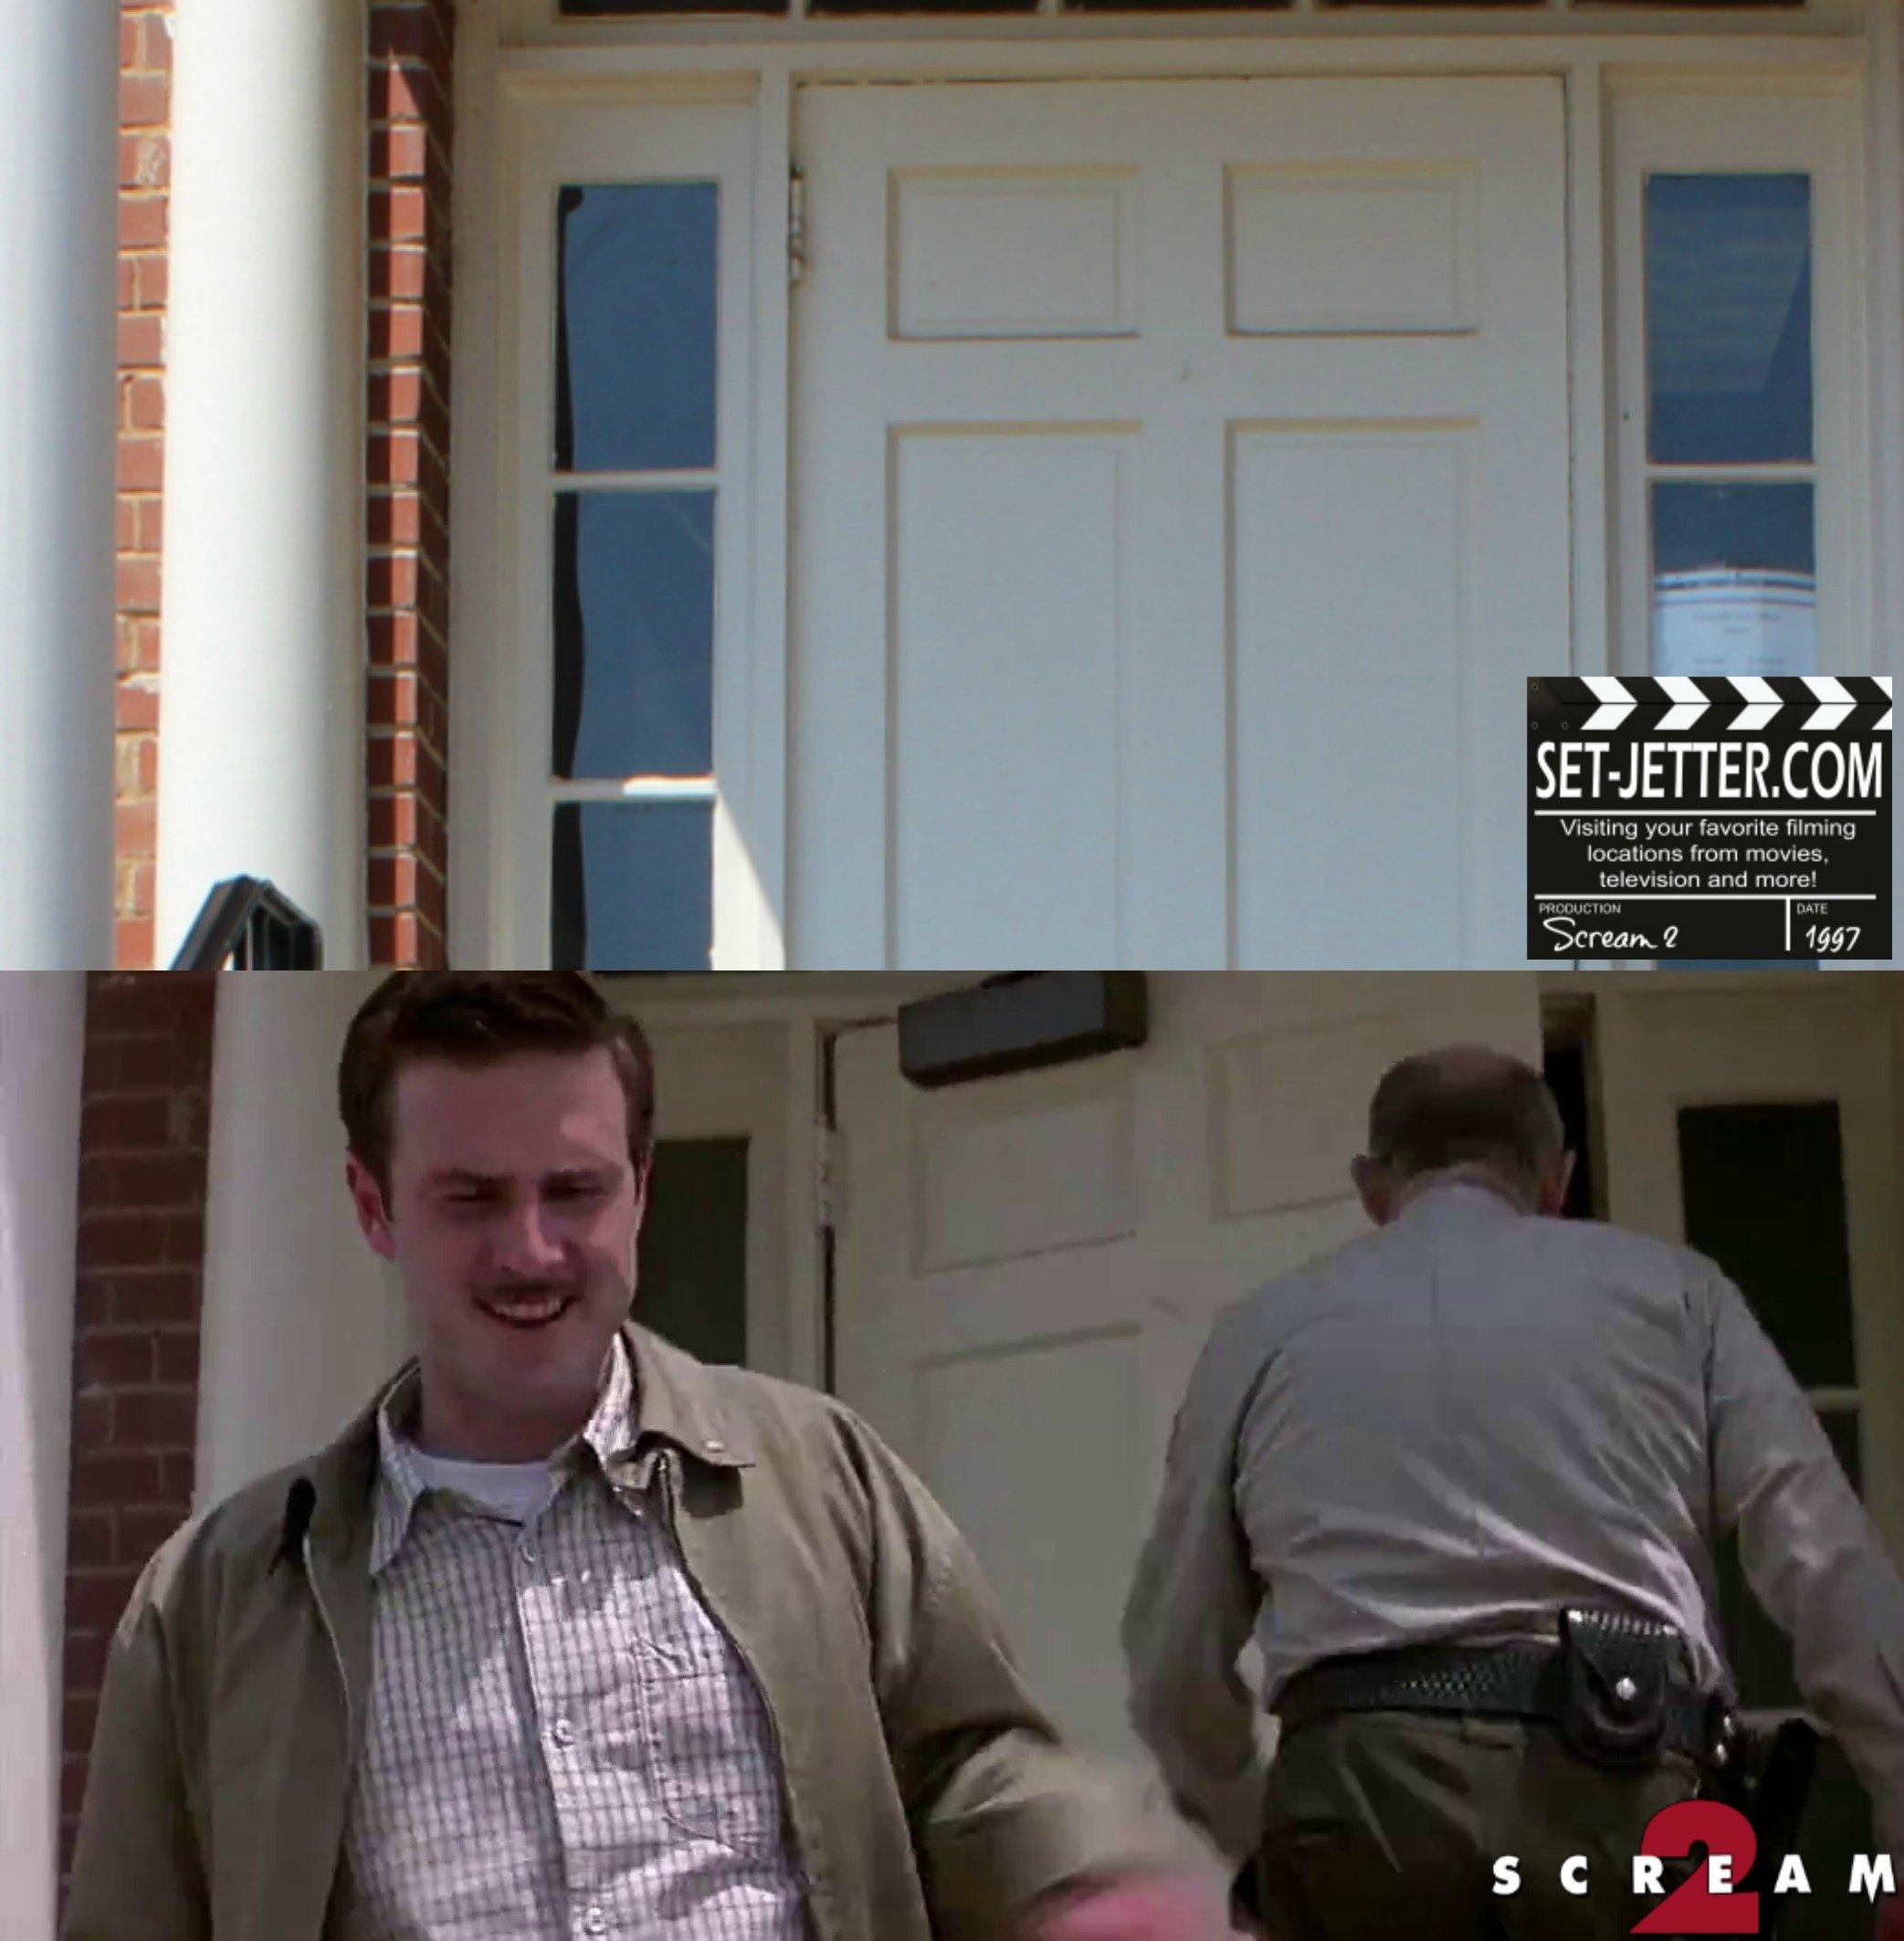 Scream 2 comparison 105.jpg